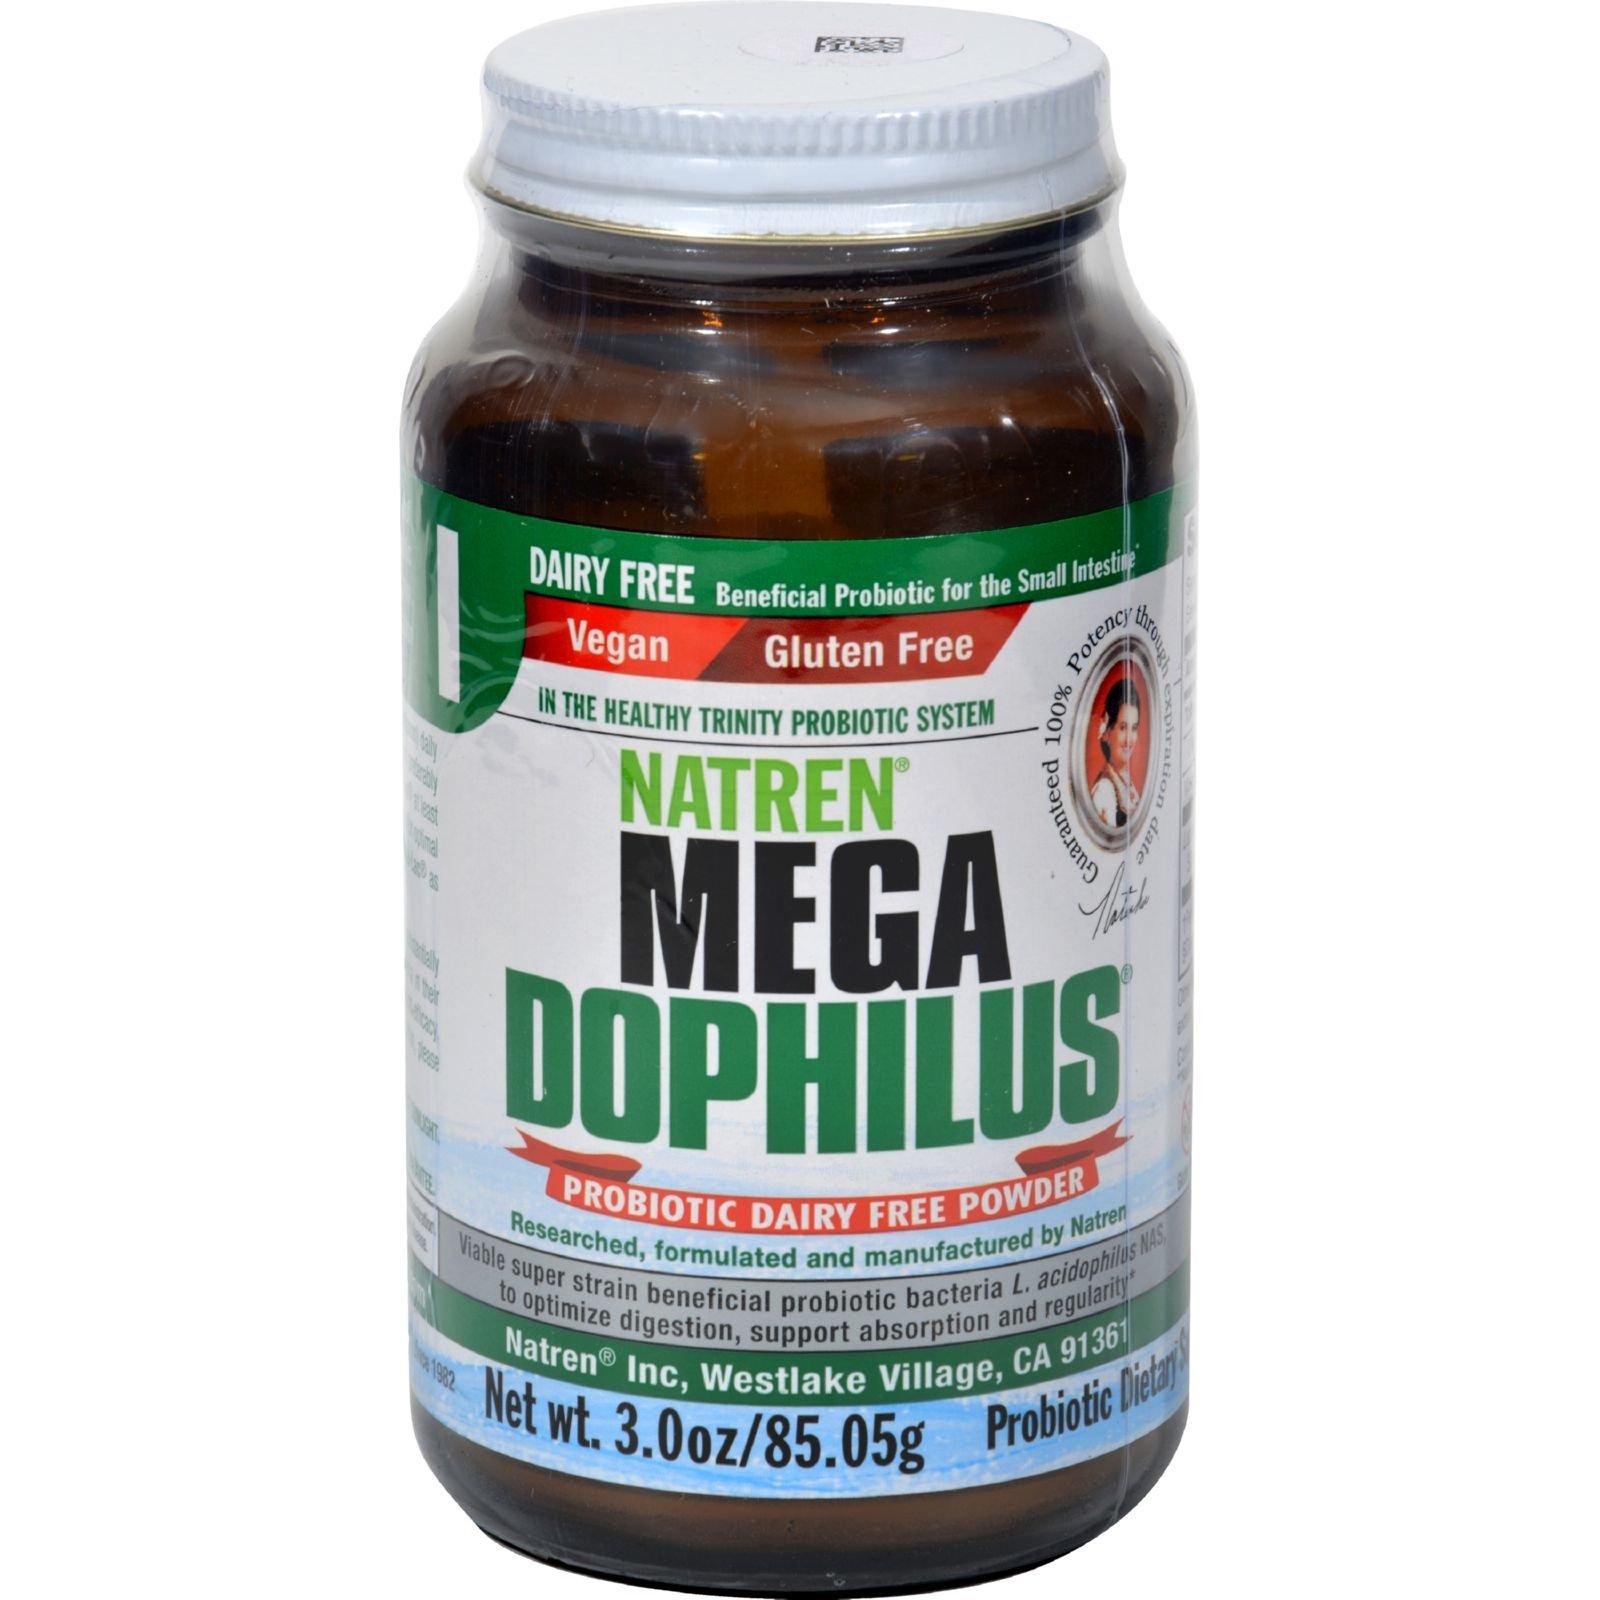 Natren Mega Dophilus - Probiotic Dairy -Free Powder - Vegan - 3 Ounce (Pack of 4)